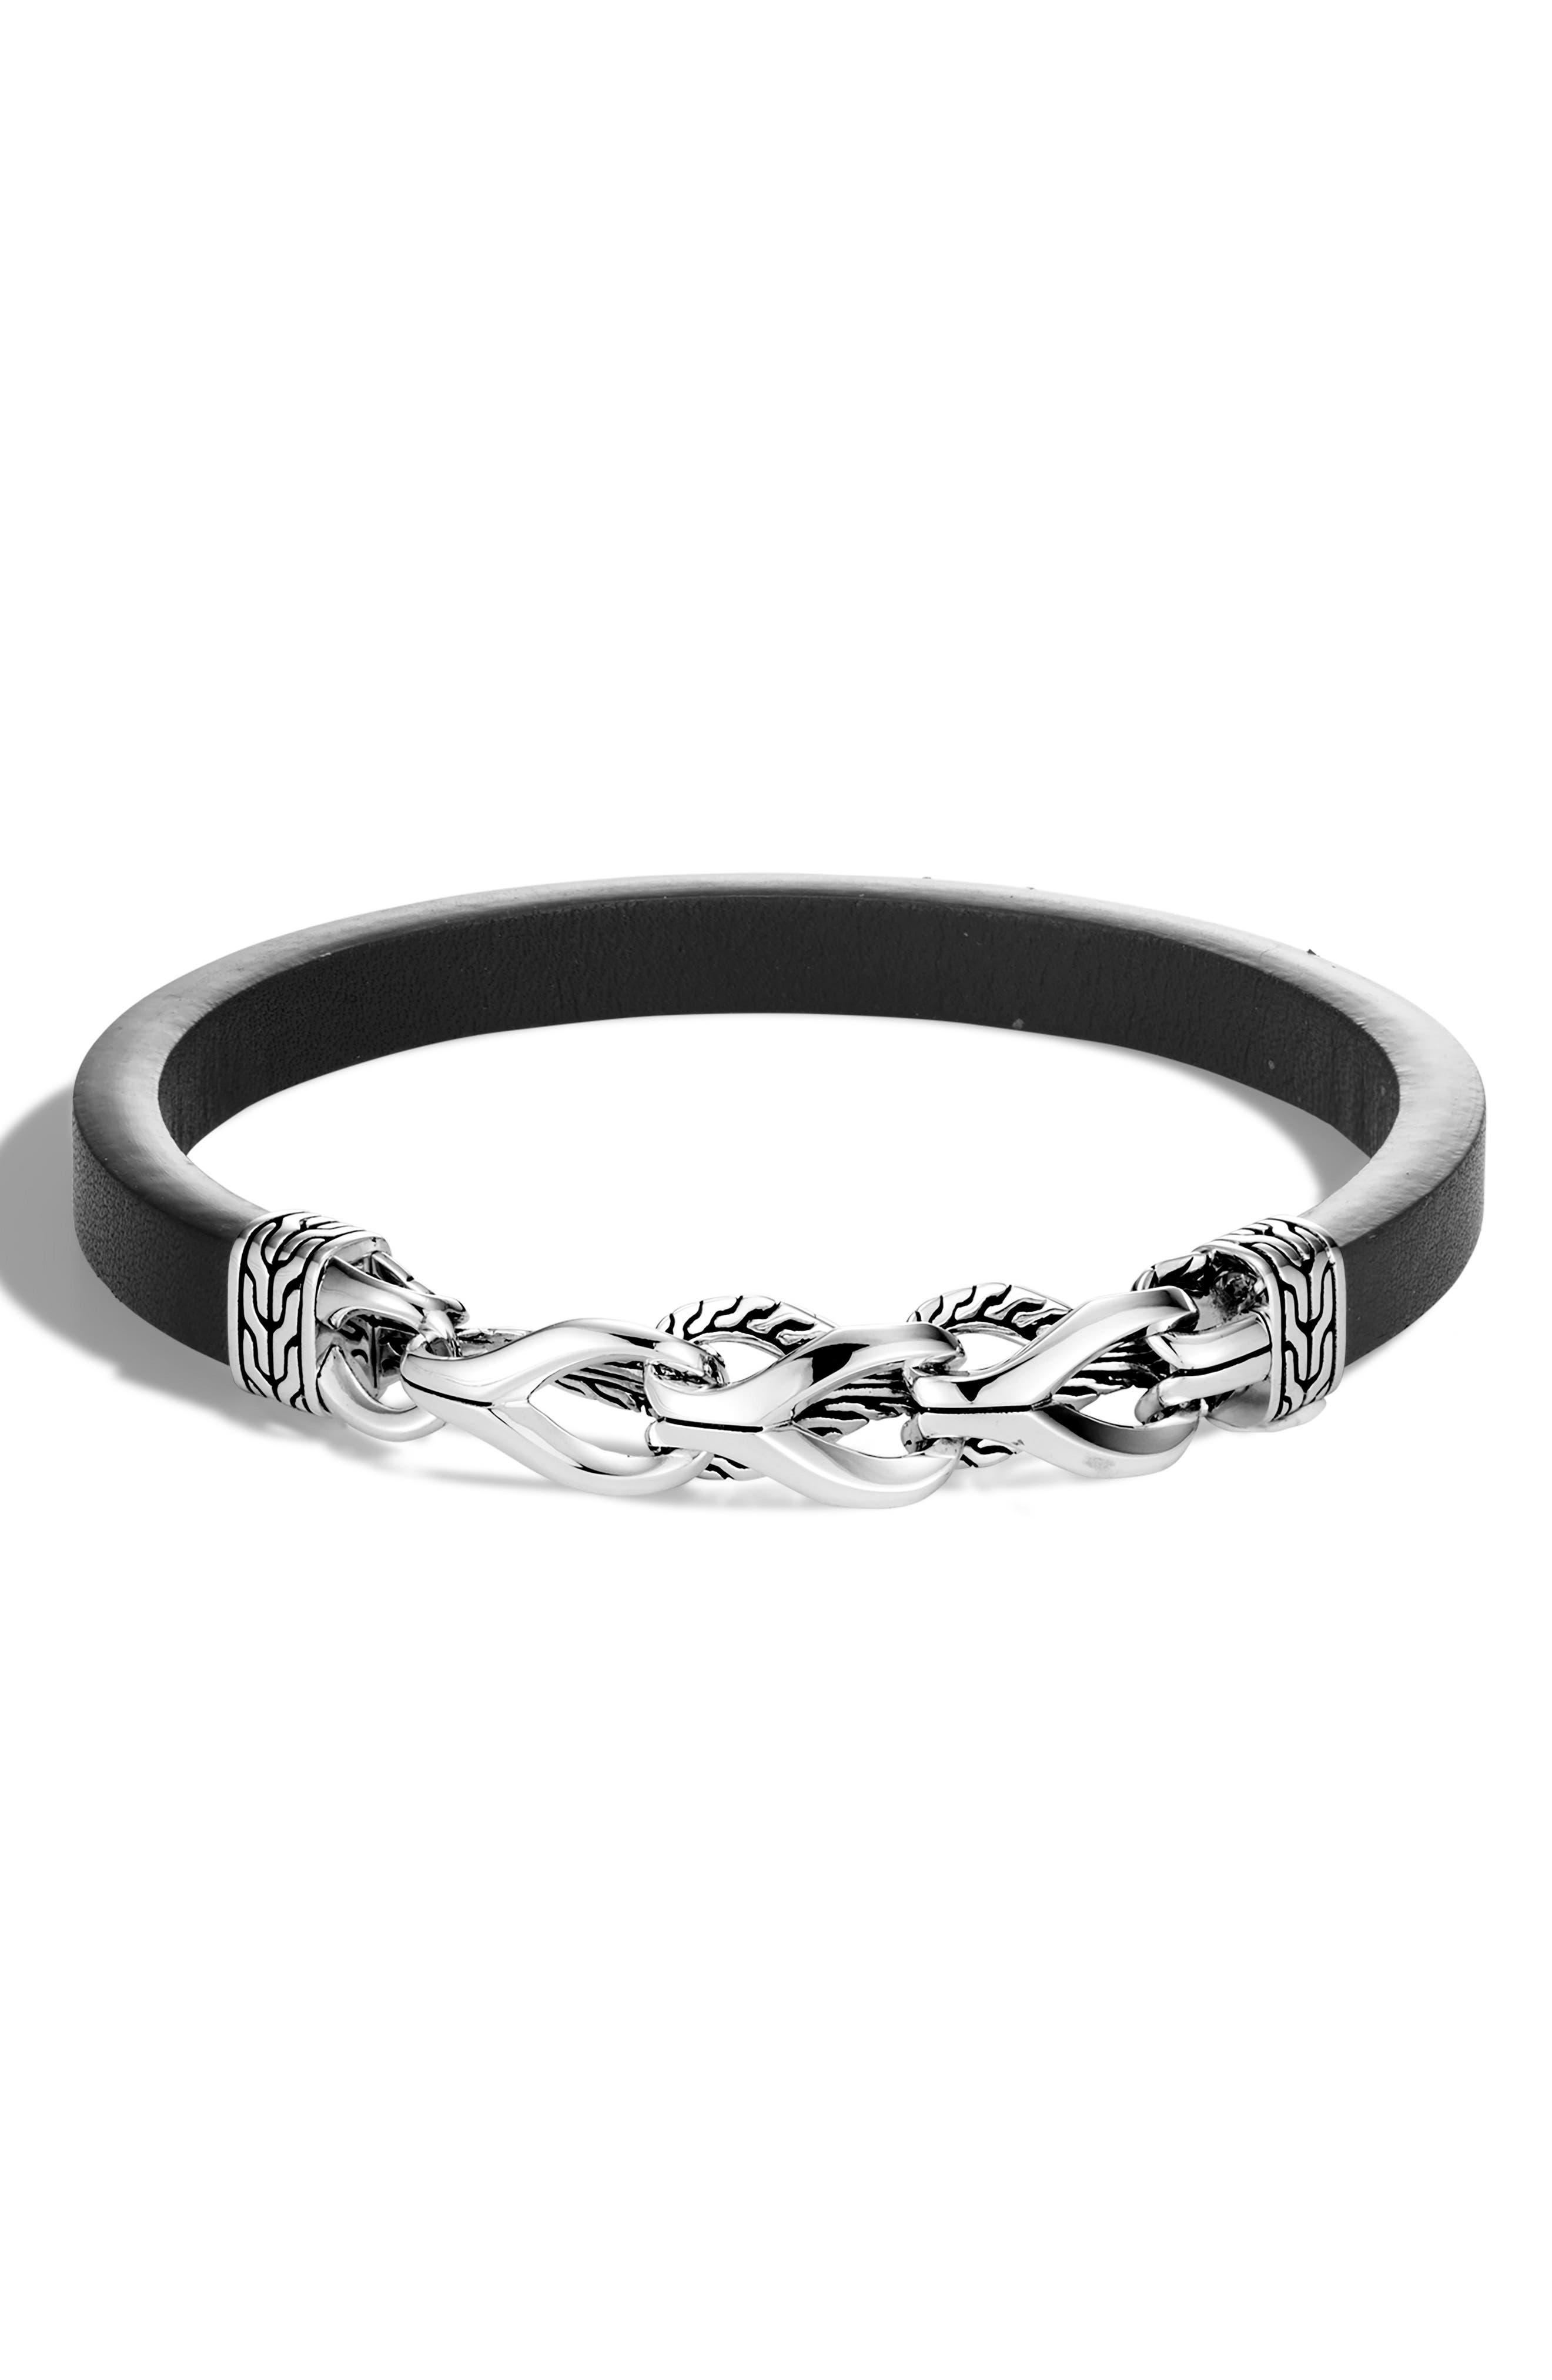 JOHN HARDY Asli Classic Chain Link Bracelet, Main, color, SILVER/ LEATHER